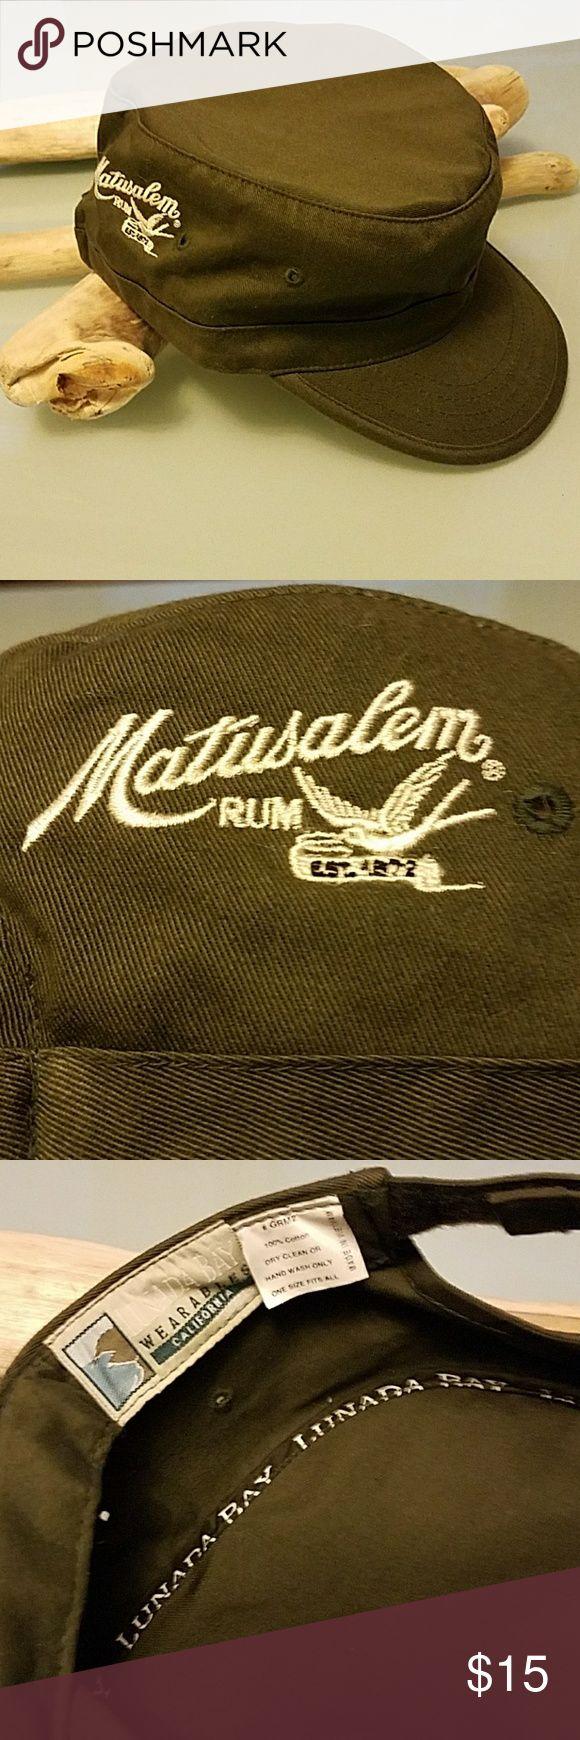 Military style hat Adjustable 100% cotton w/Matusalem Rum logo lunata bay Accessories Hats